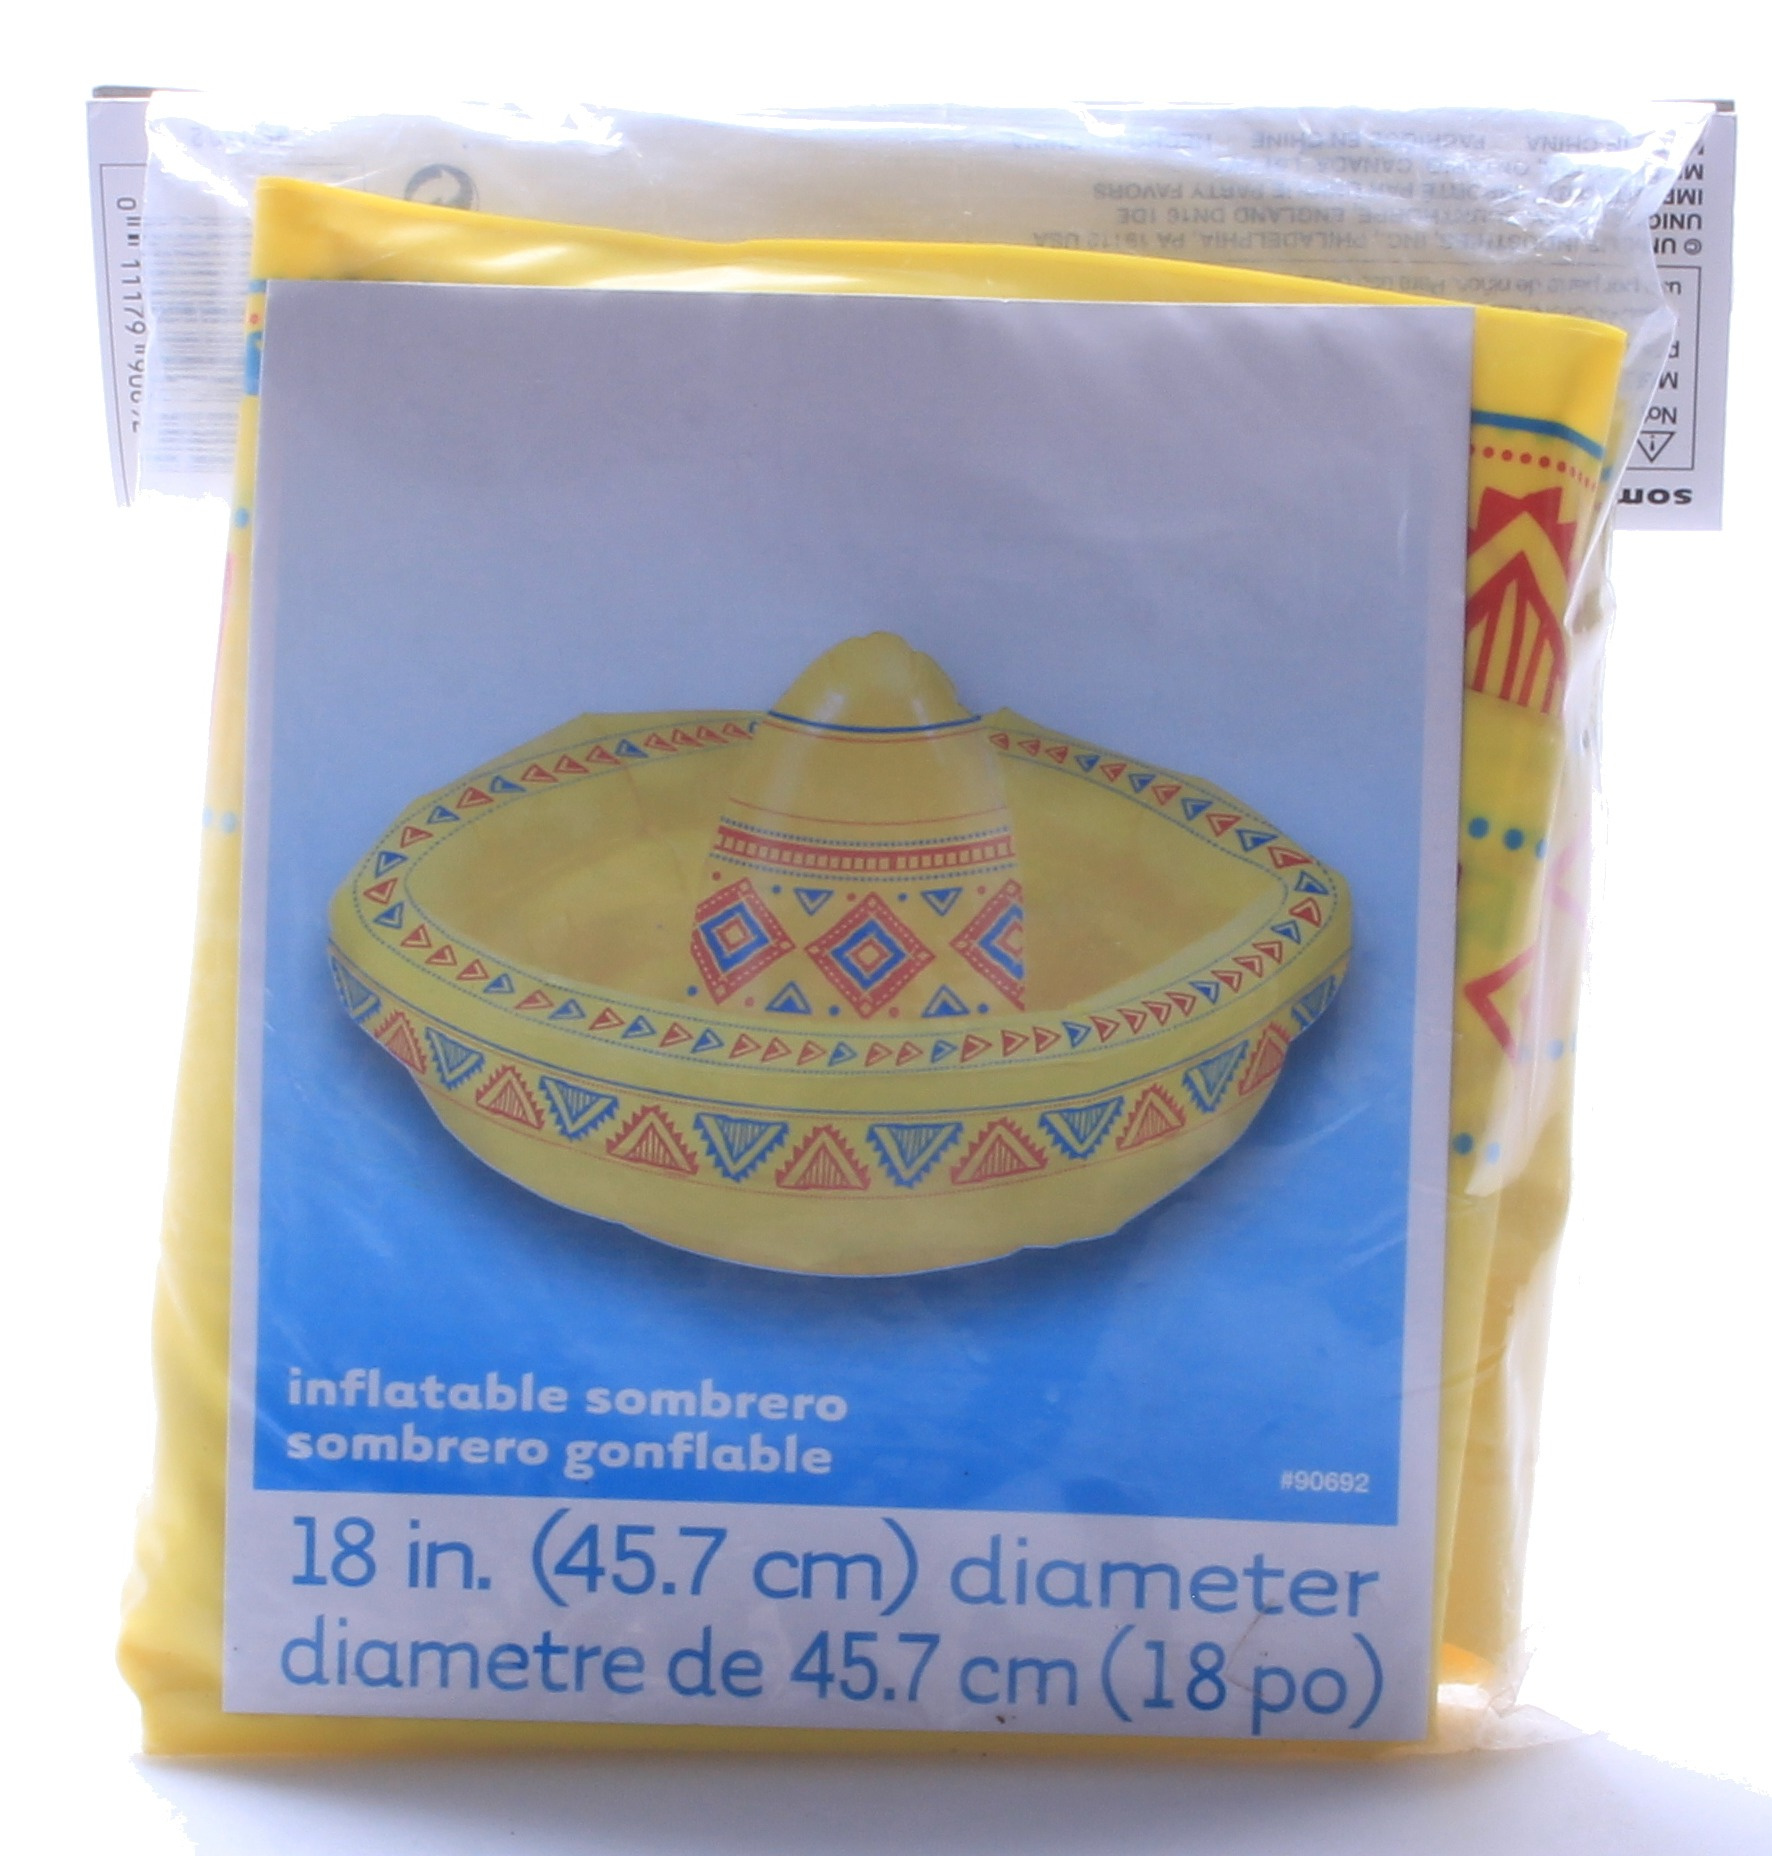 Inflatable Sombrero Unique 90692